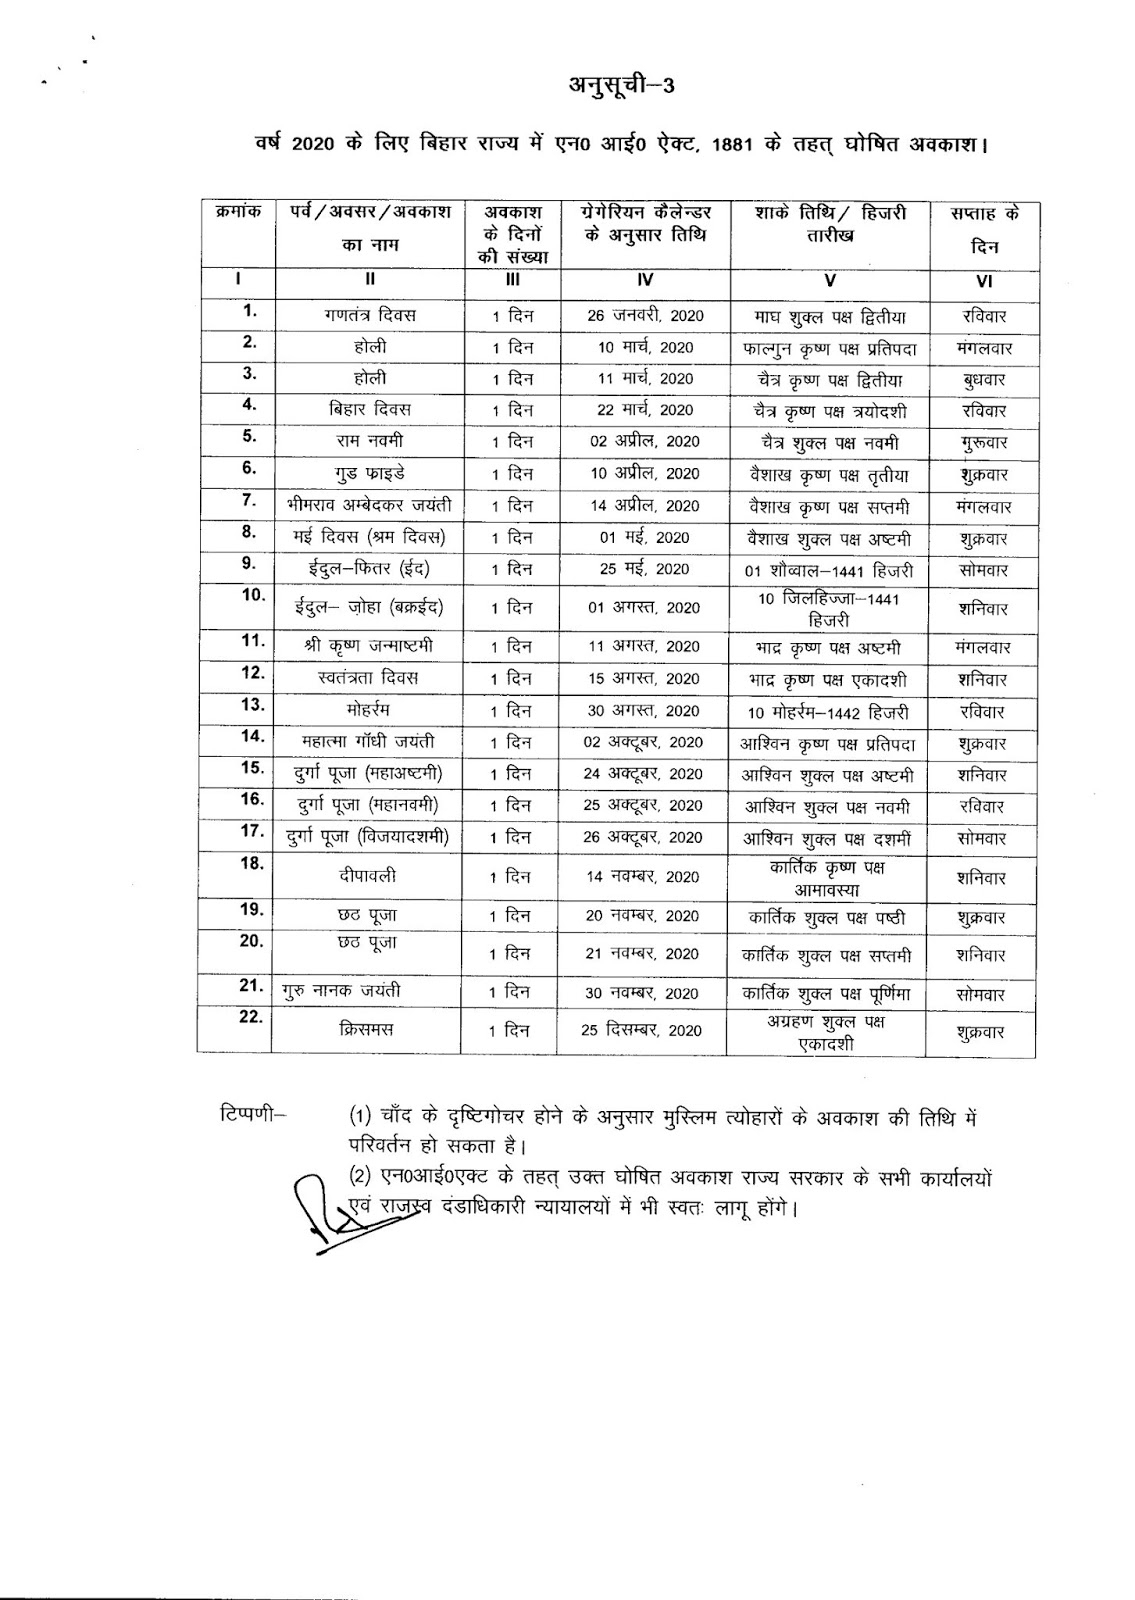 Bihar Government Calendar 2020 #educratsweb in Bihar Govt Holidays 2020